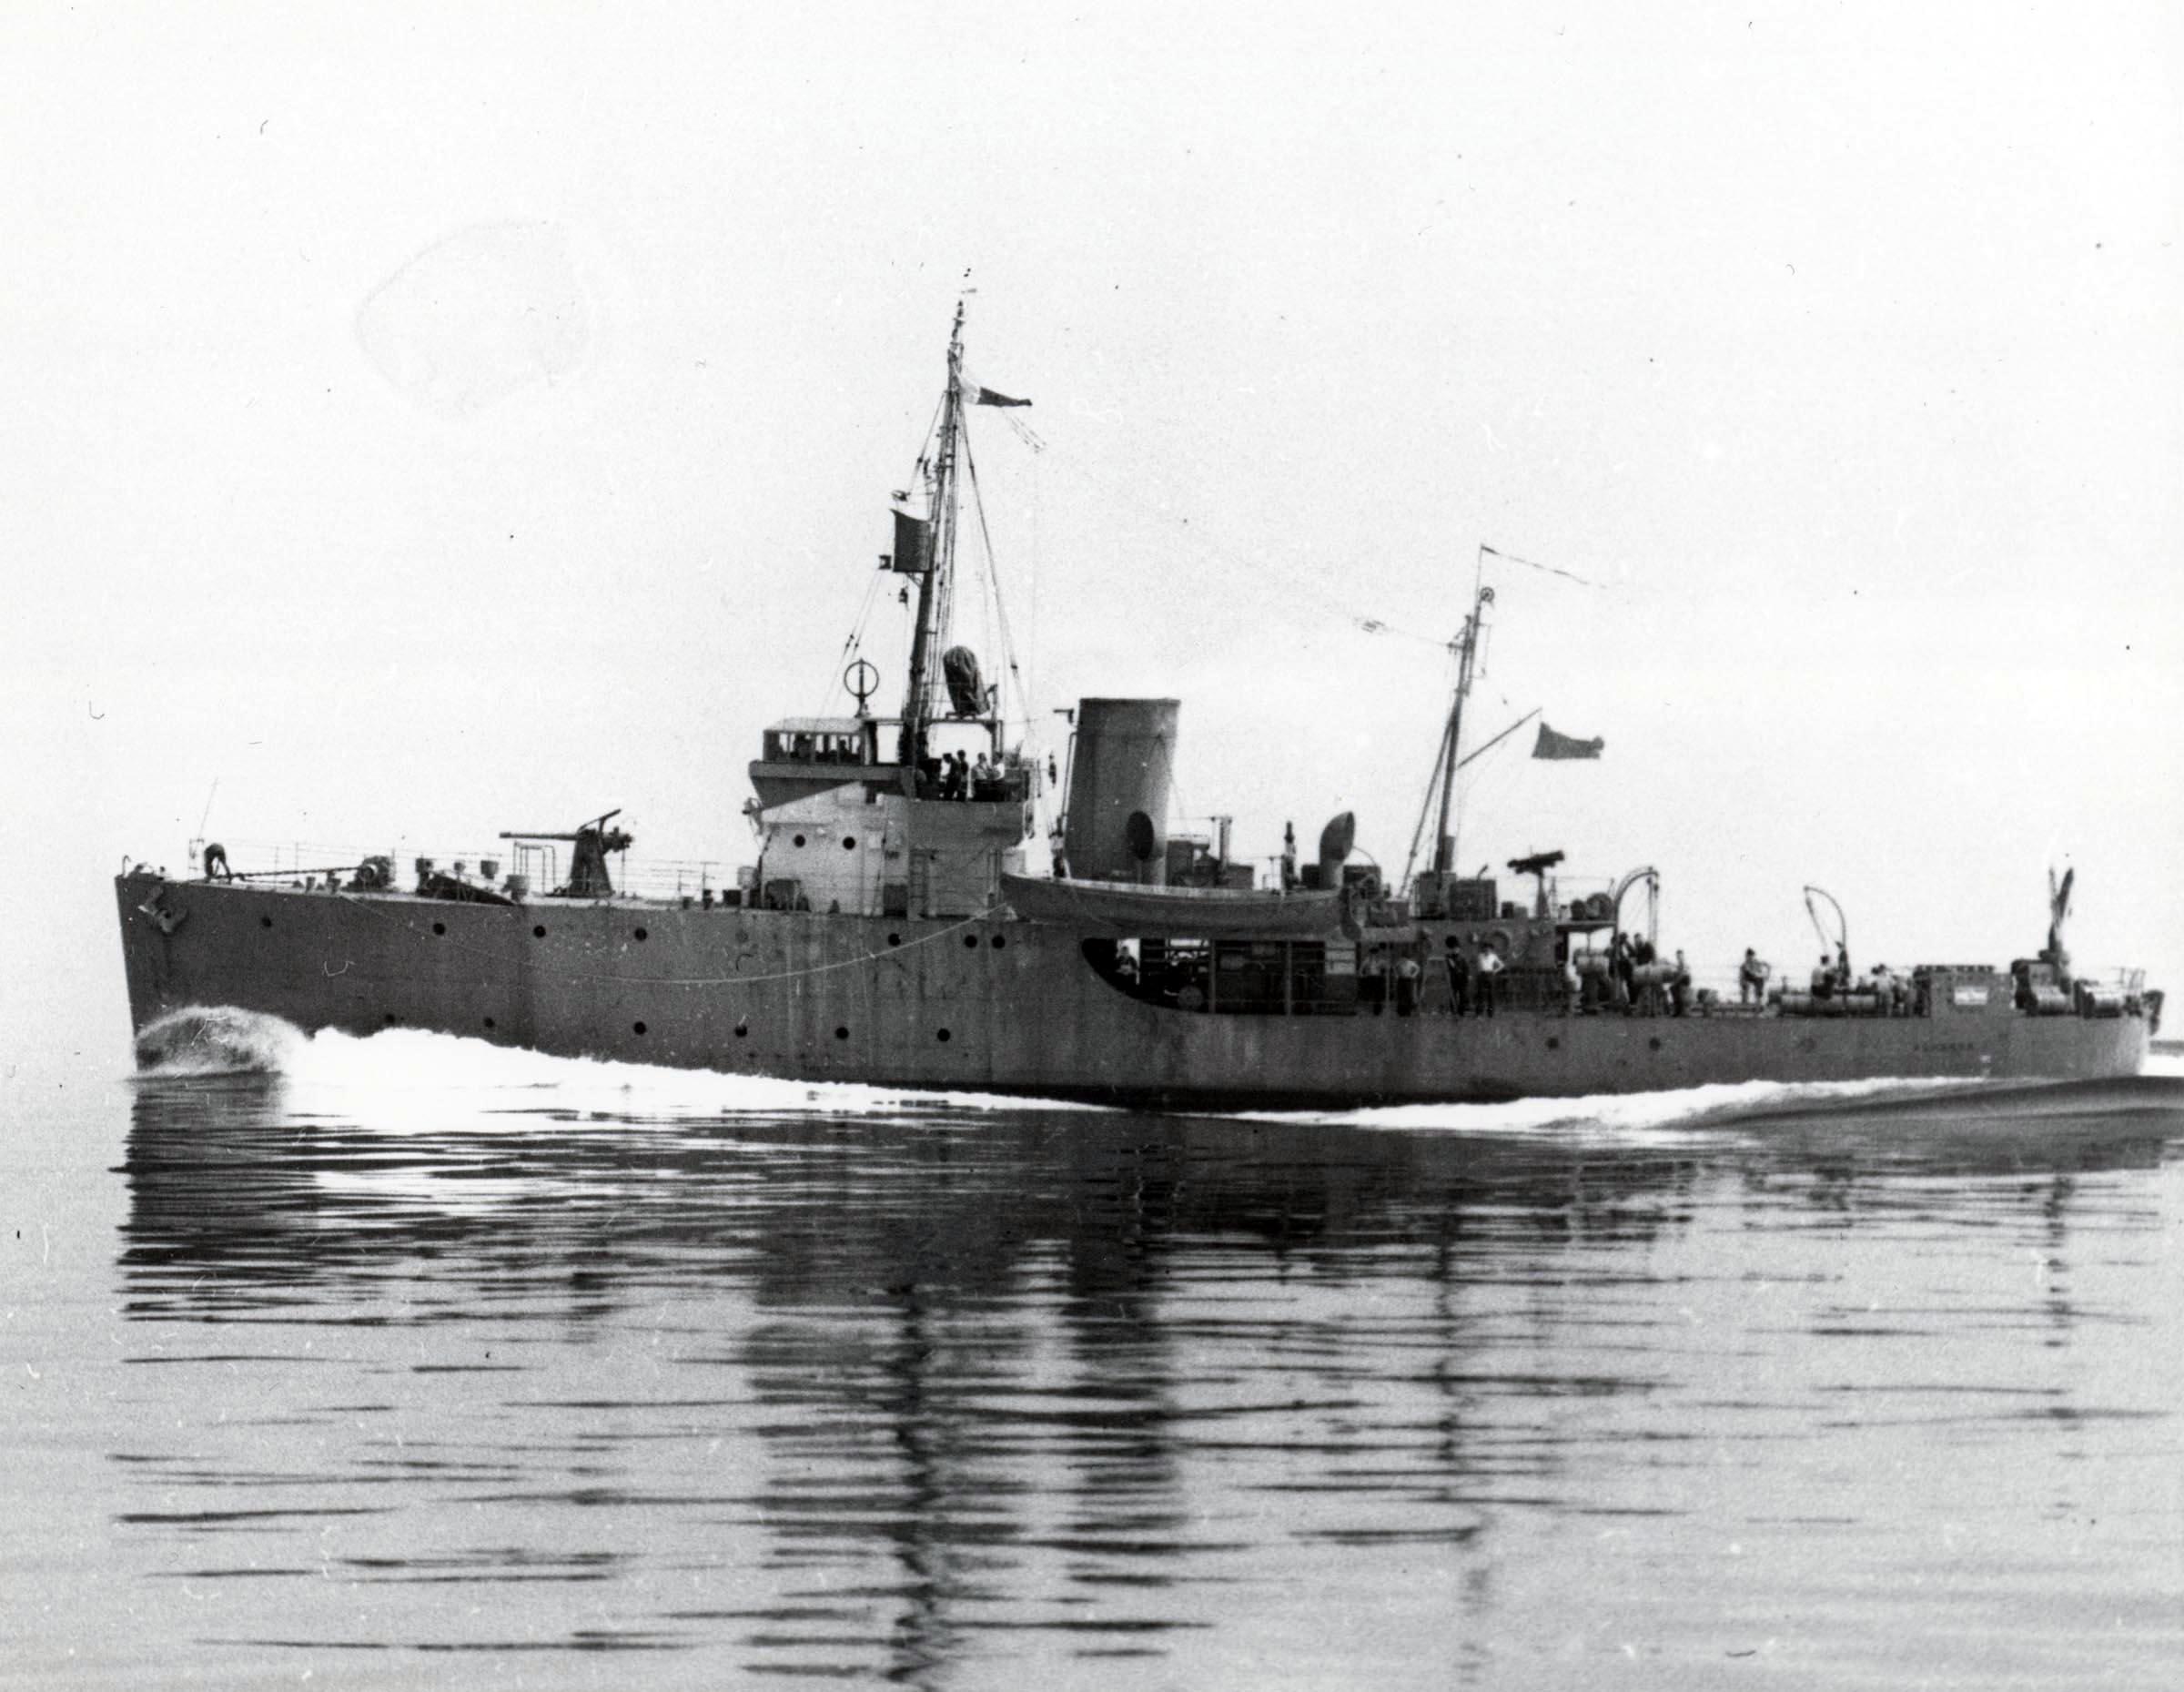 HMCS NORANDA